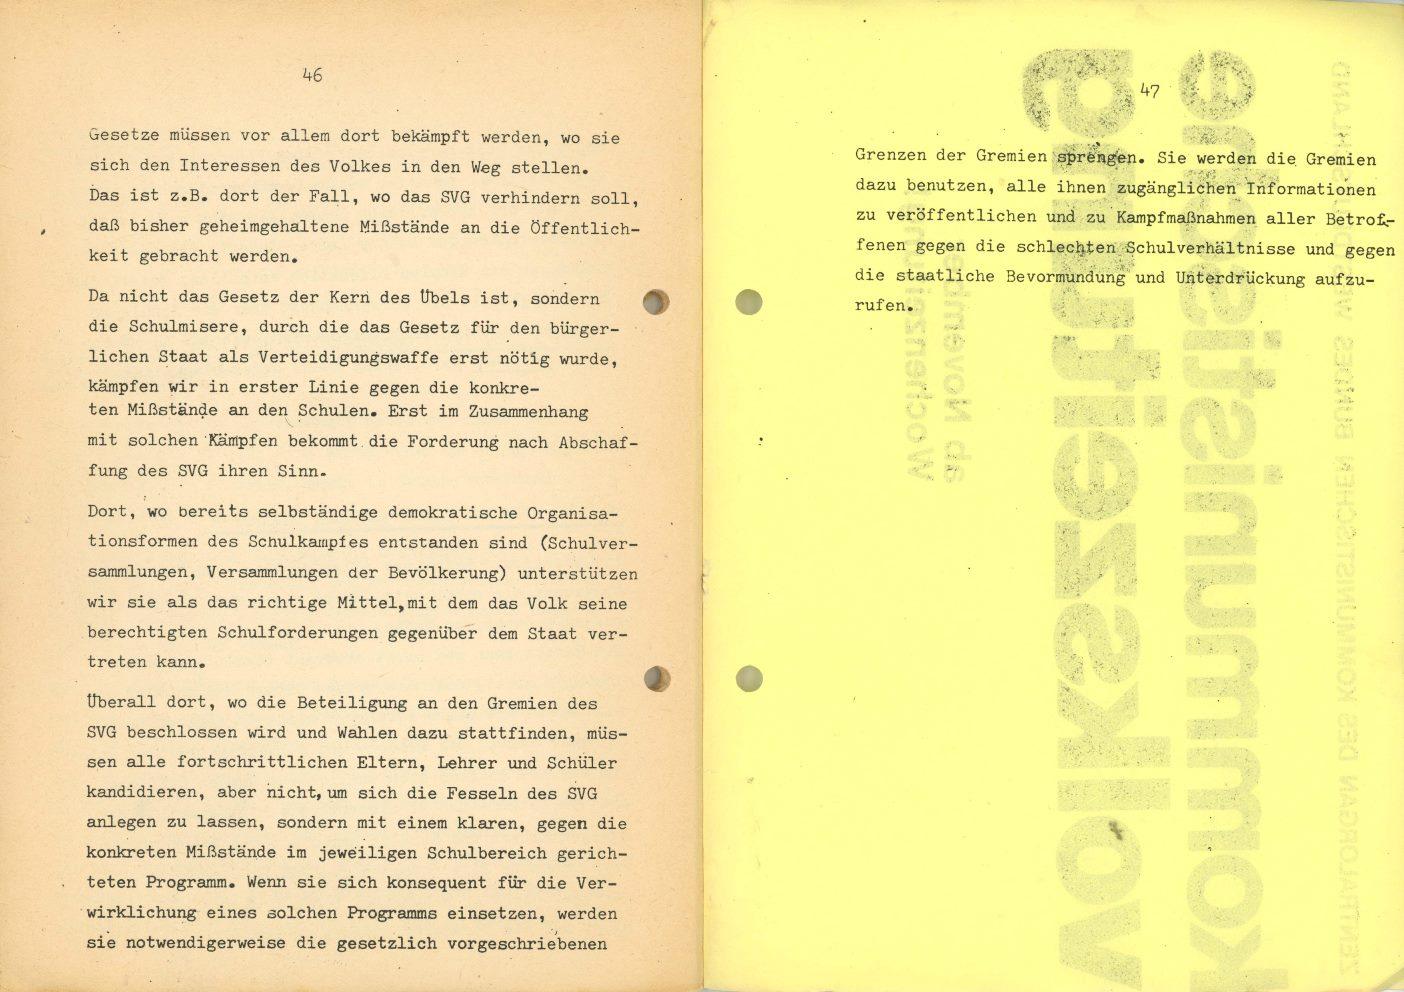 Berlin_SMV_GUV_1974_Schulmisere_26